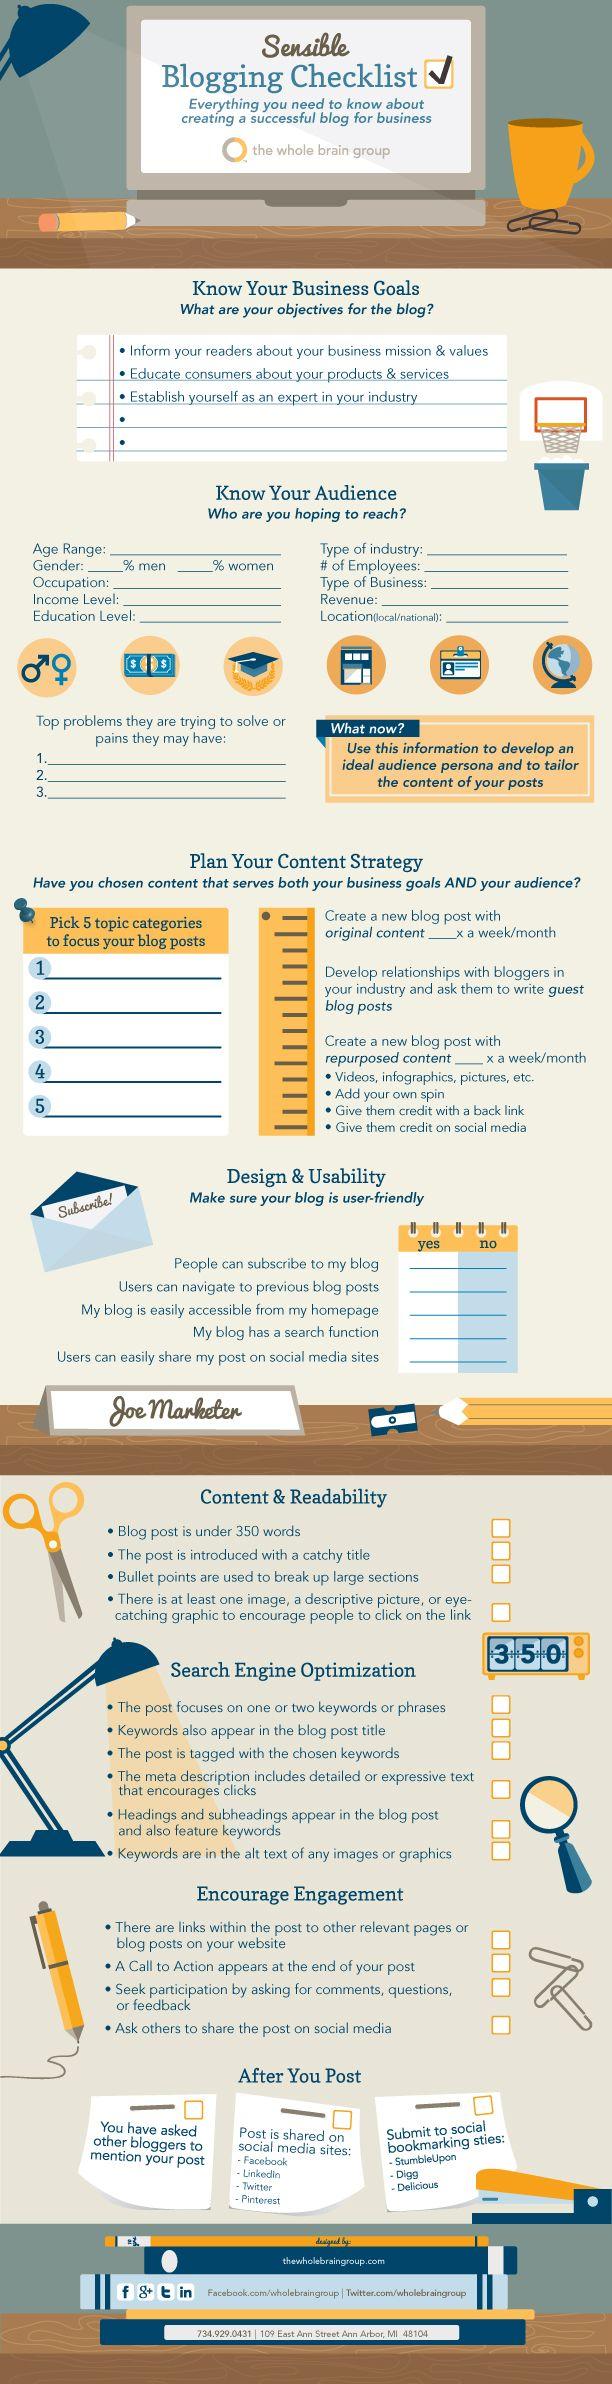 #Blogging Checklist [INFOGRAPHIC] - A sensible blogging checklist for successful business blogs.